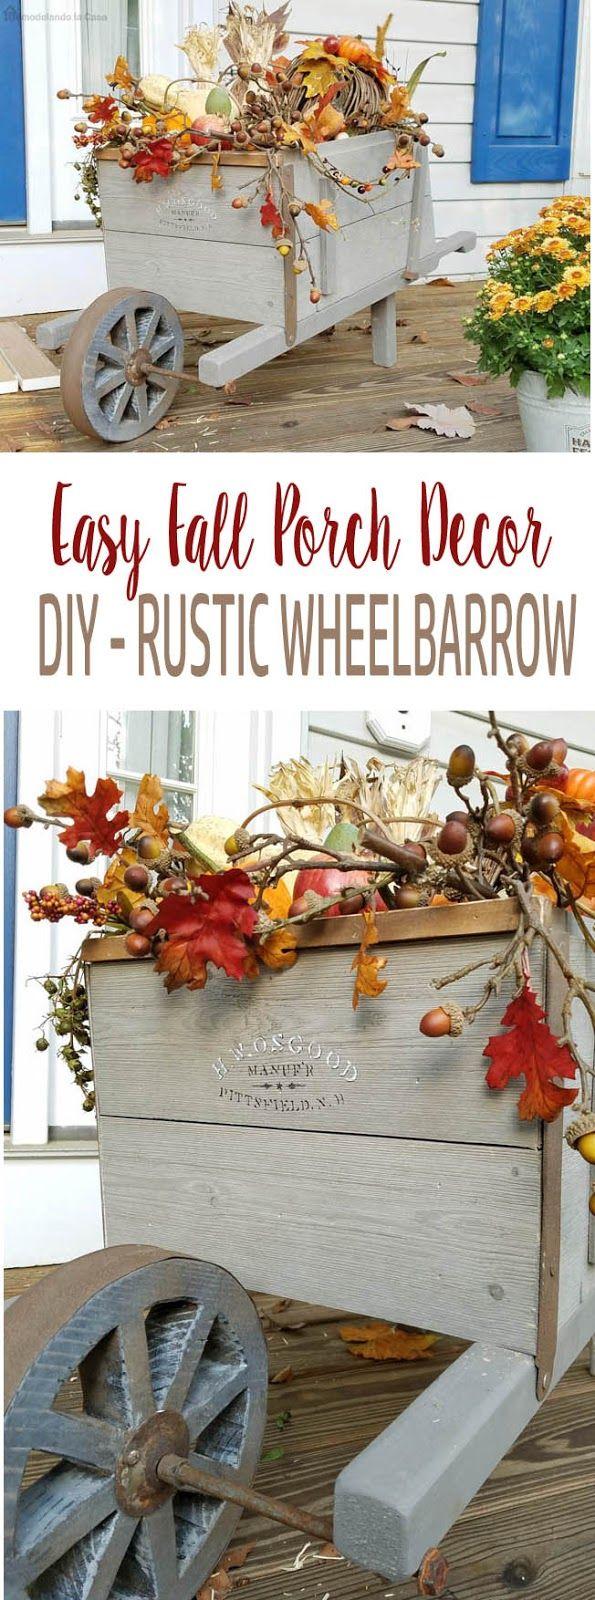 Diy Rustic Wheelbarrow Dih Workshop Amp Virtual Party